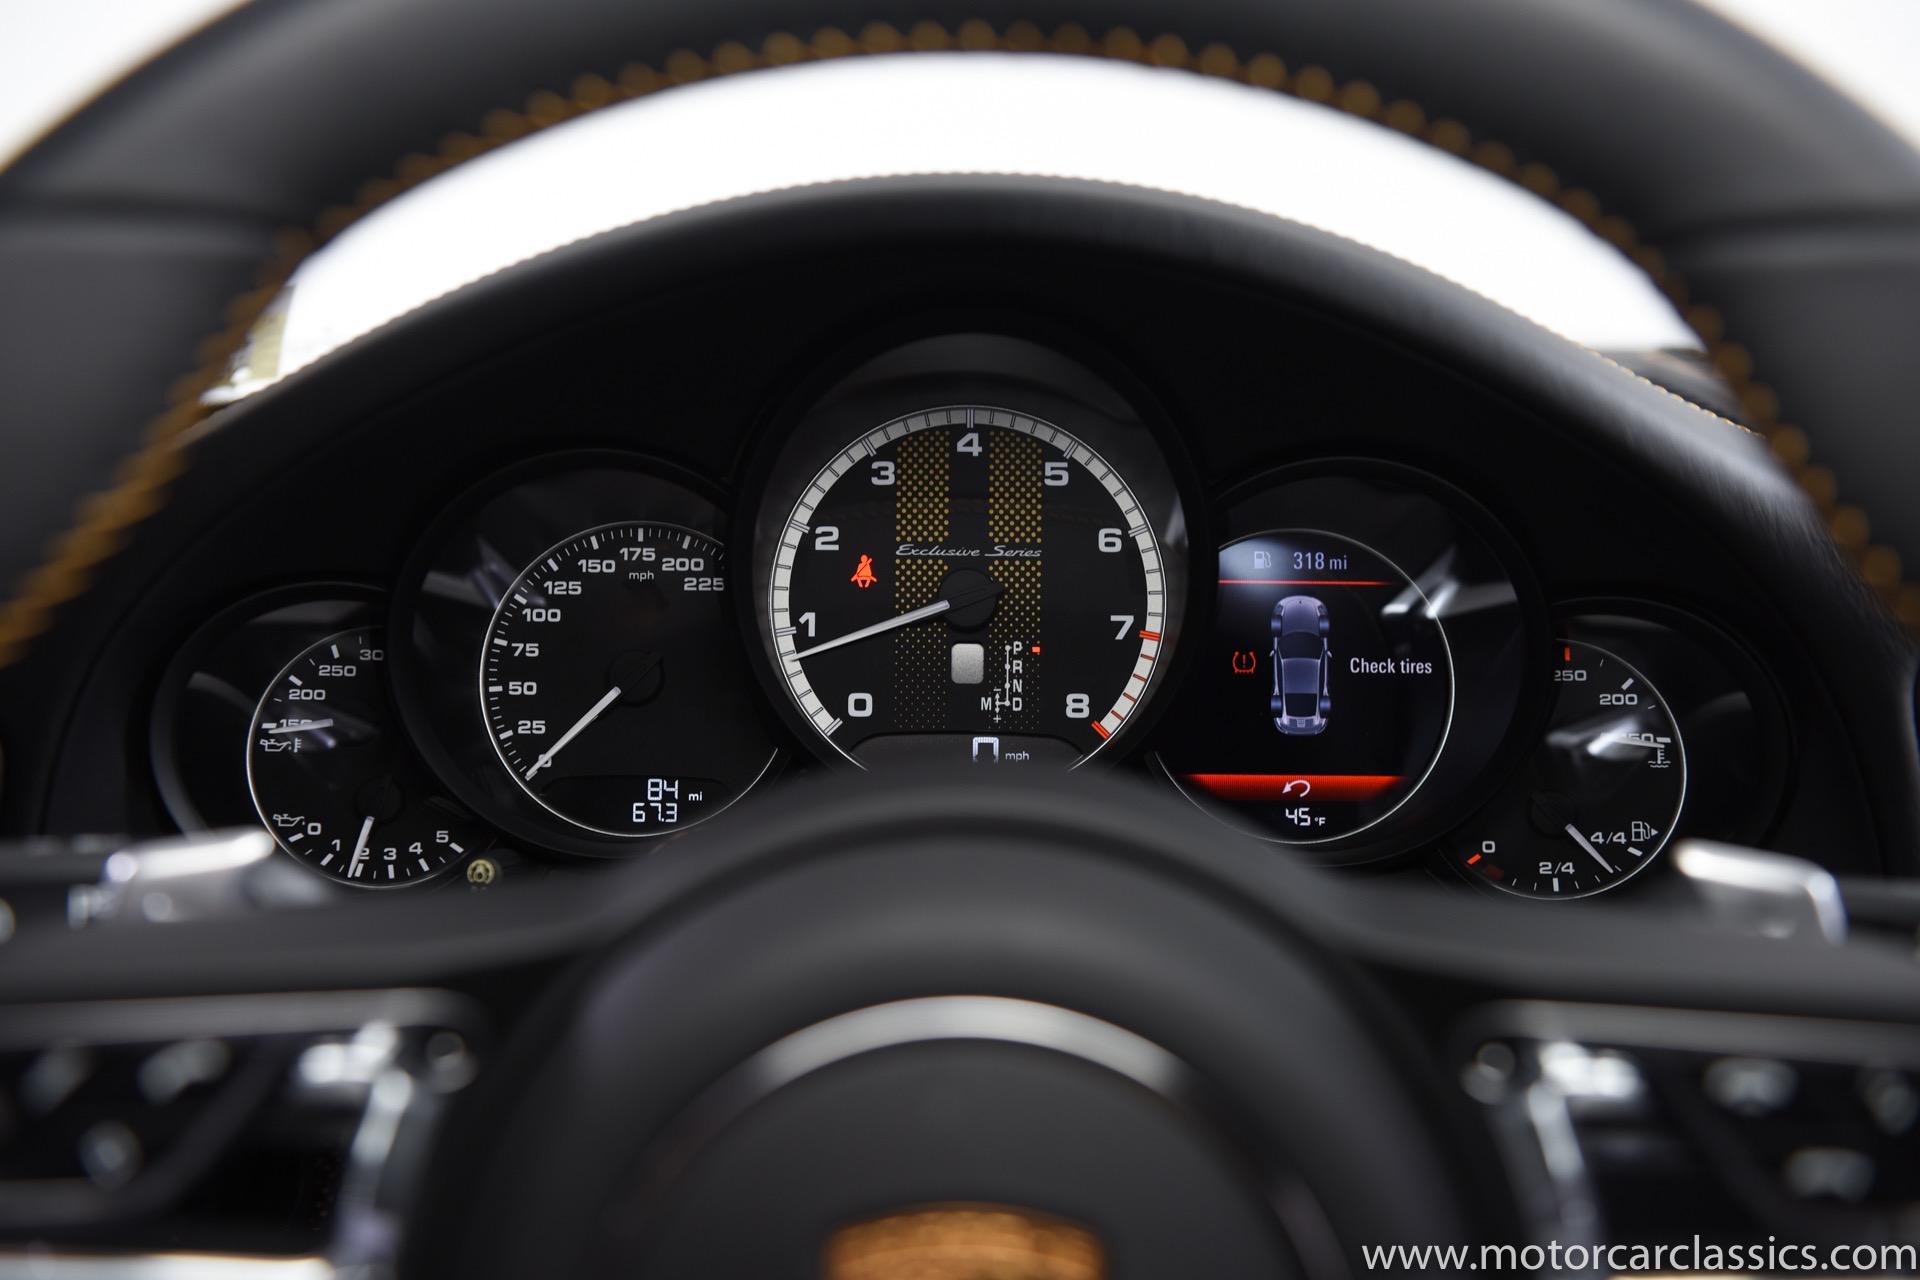 2018 Porsche 911 Turbo S Exclusive